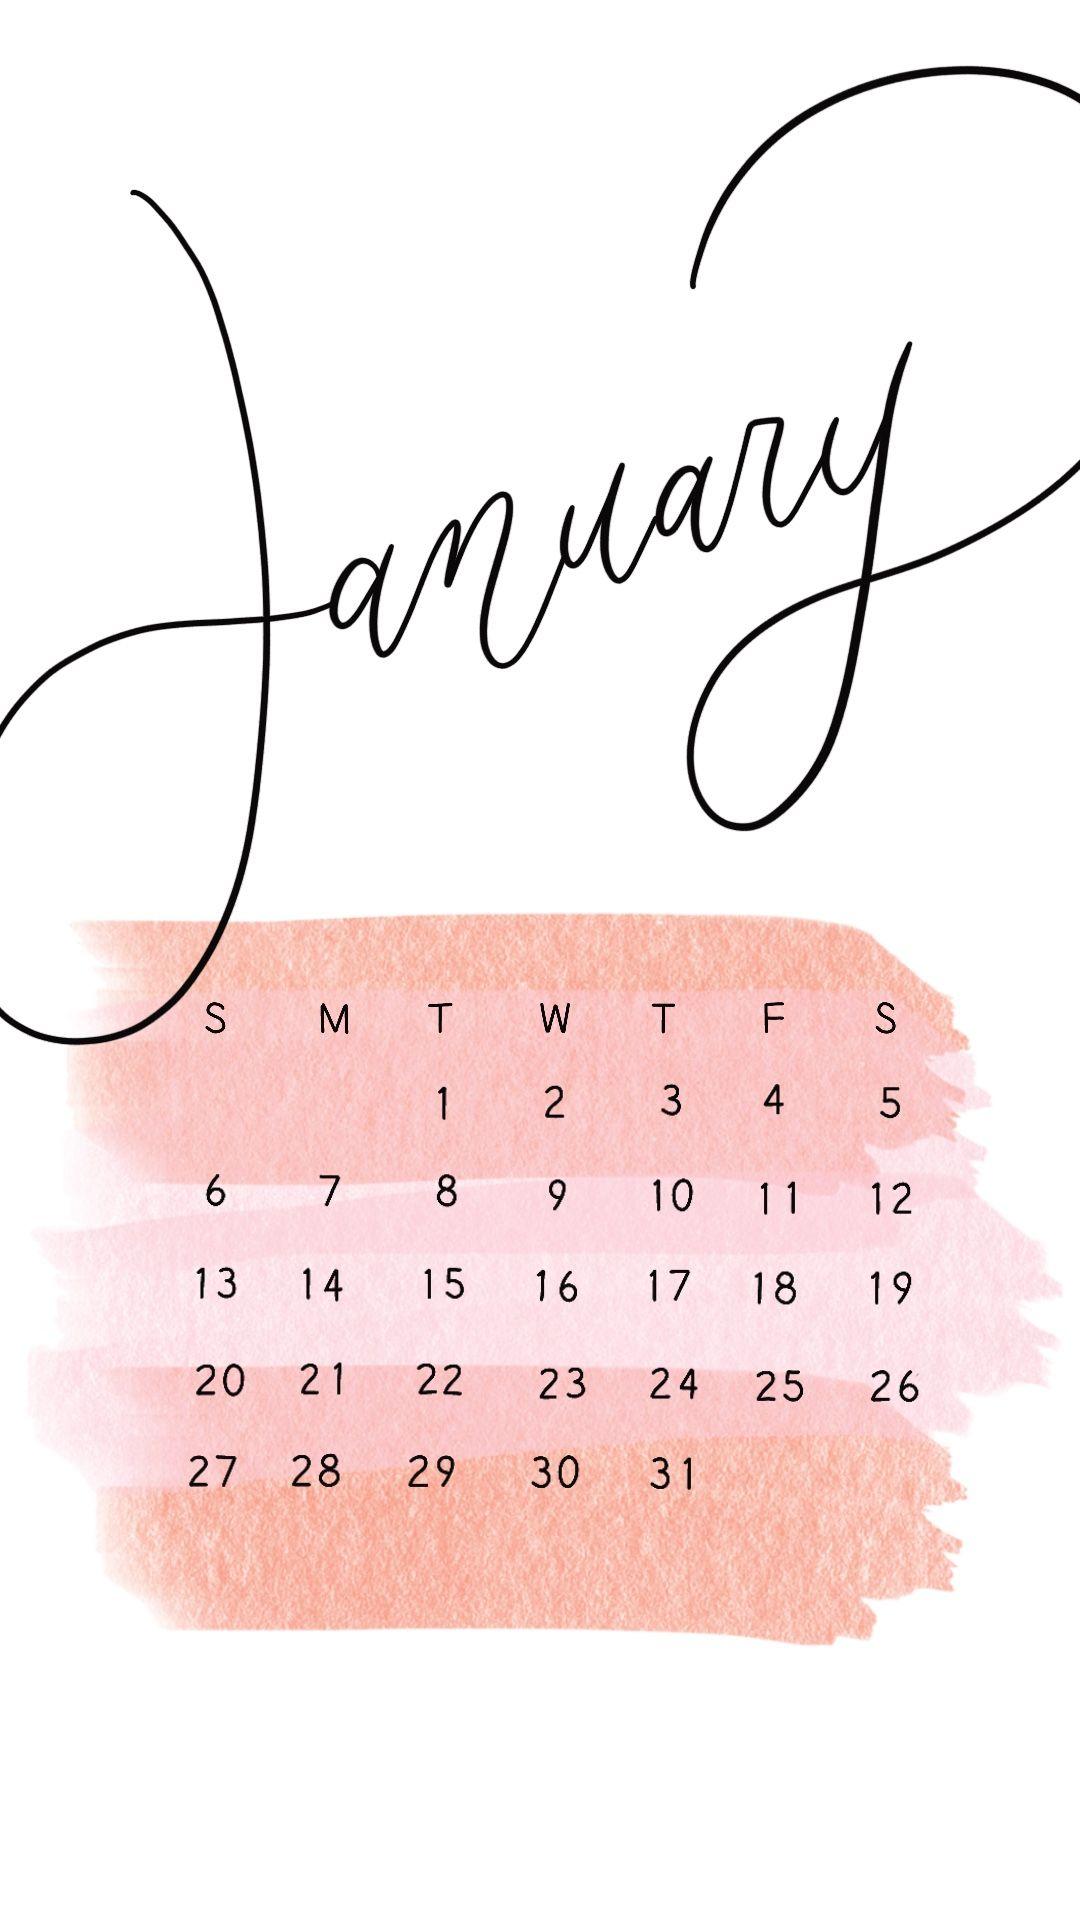 FREE January 2019 Calendar Design Wallpaper Calendar